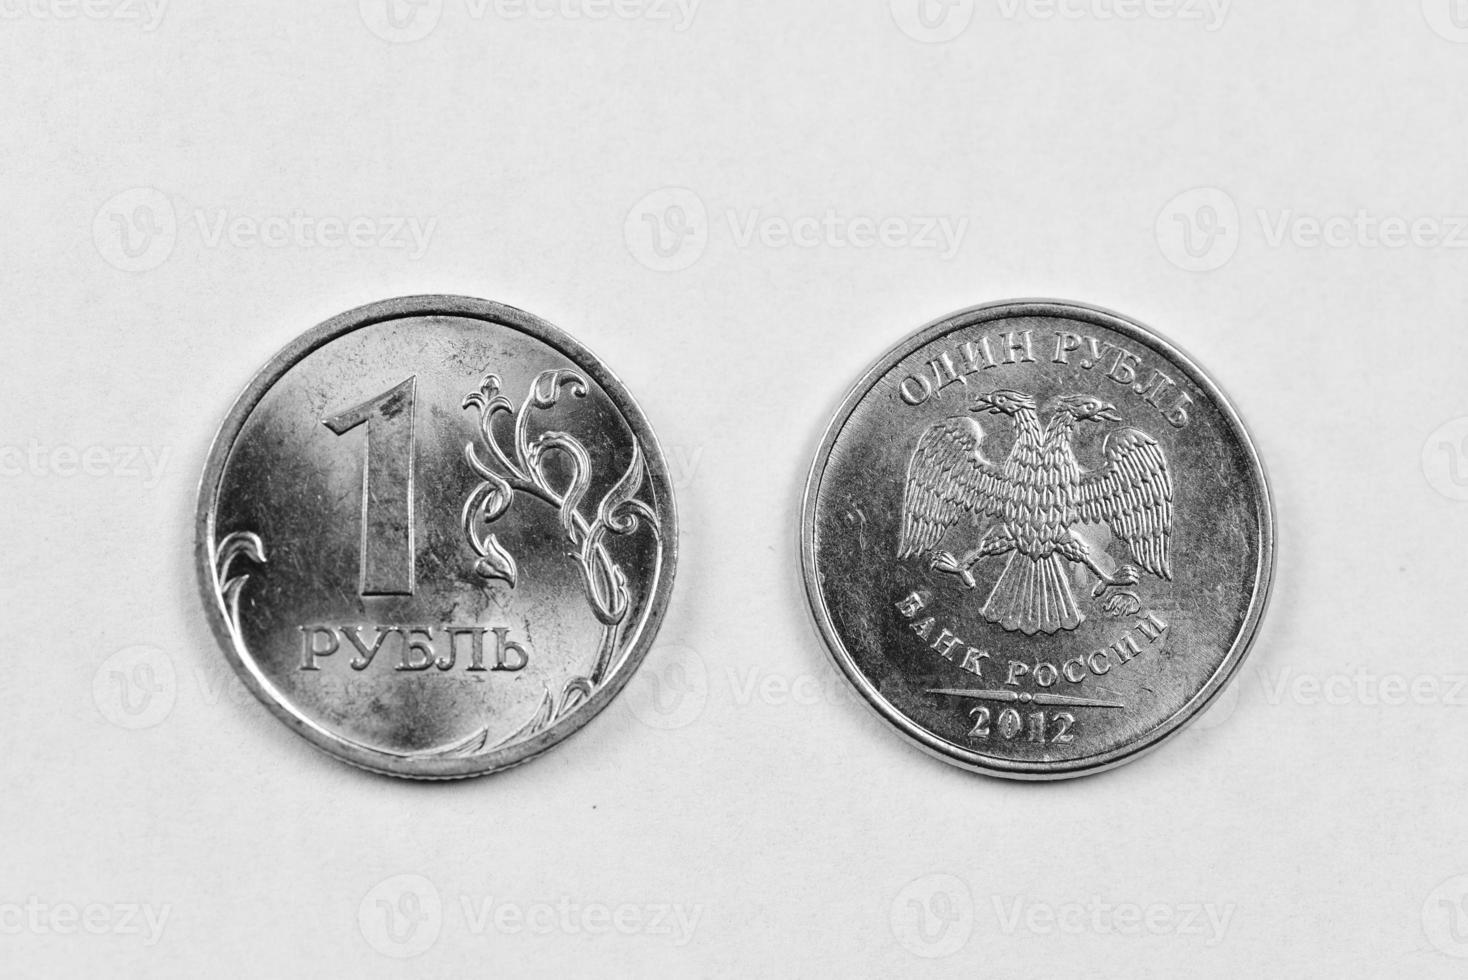 moneta russa - 1 rublo foto